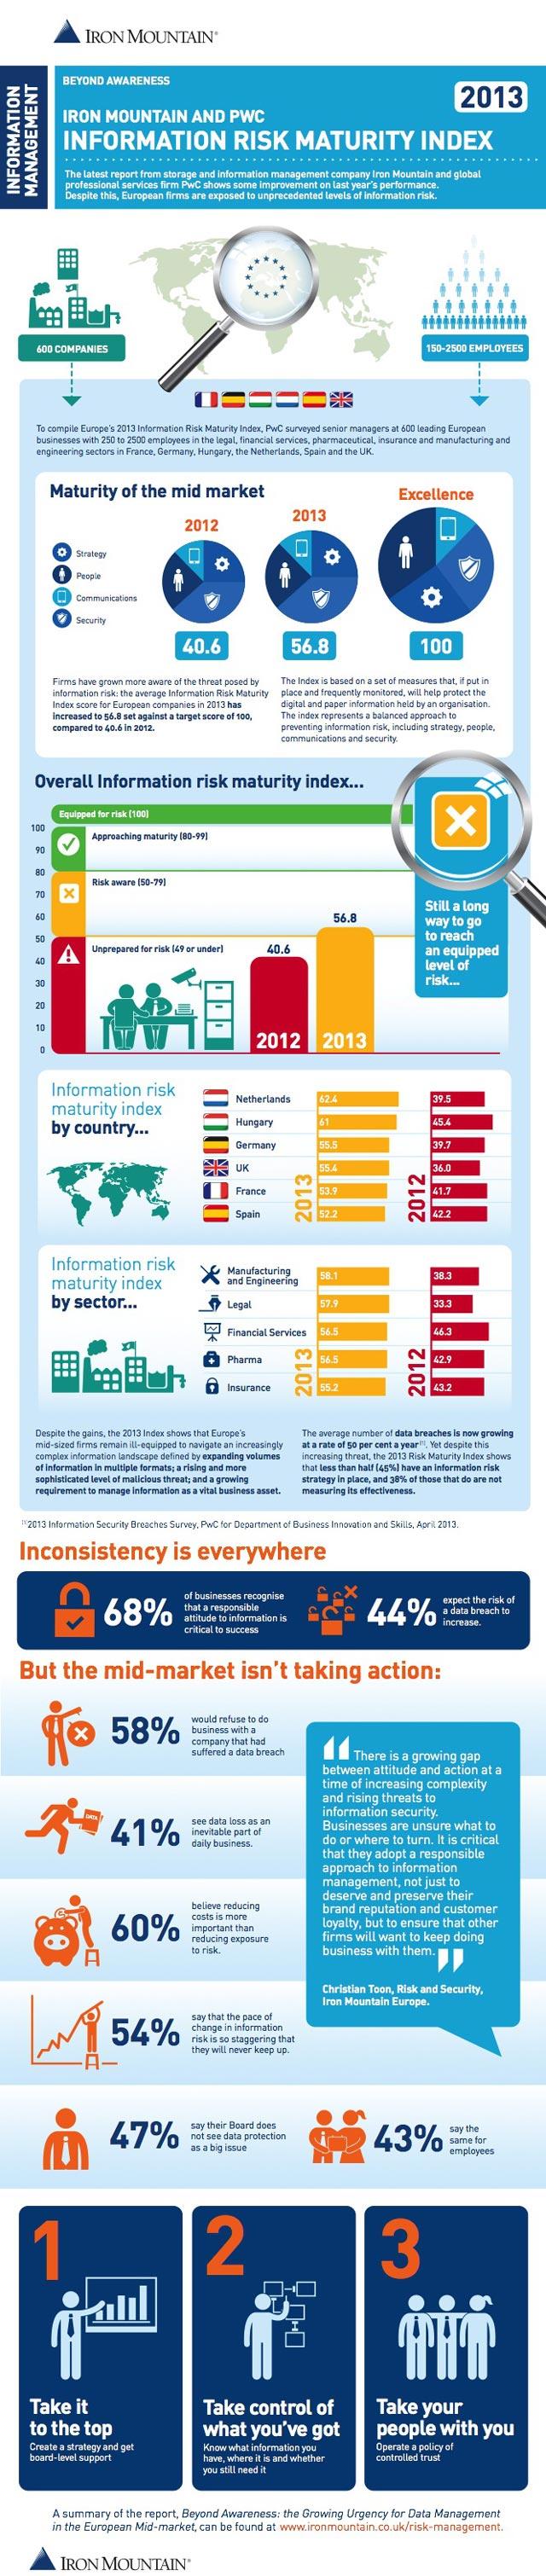 im-infographic